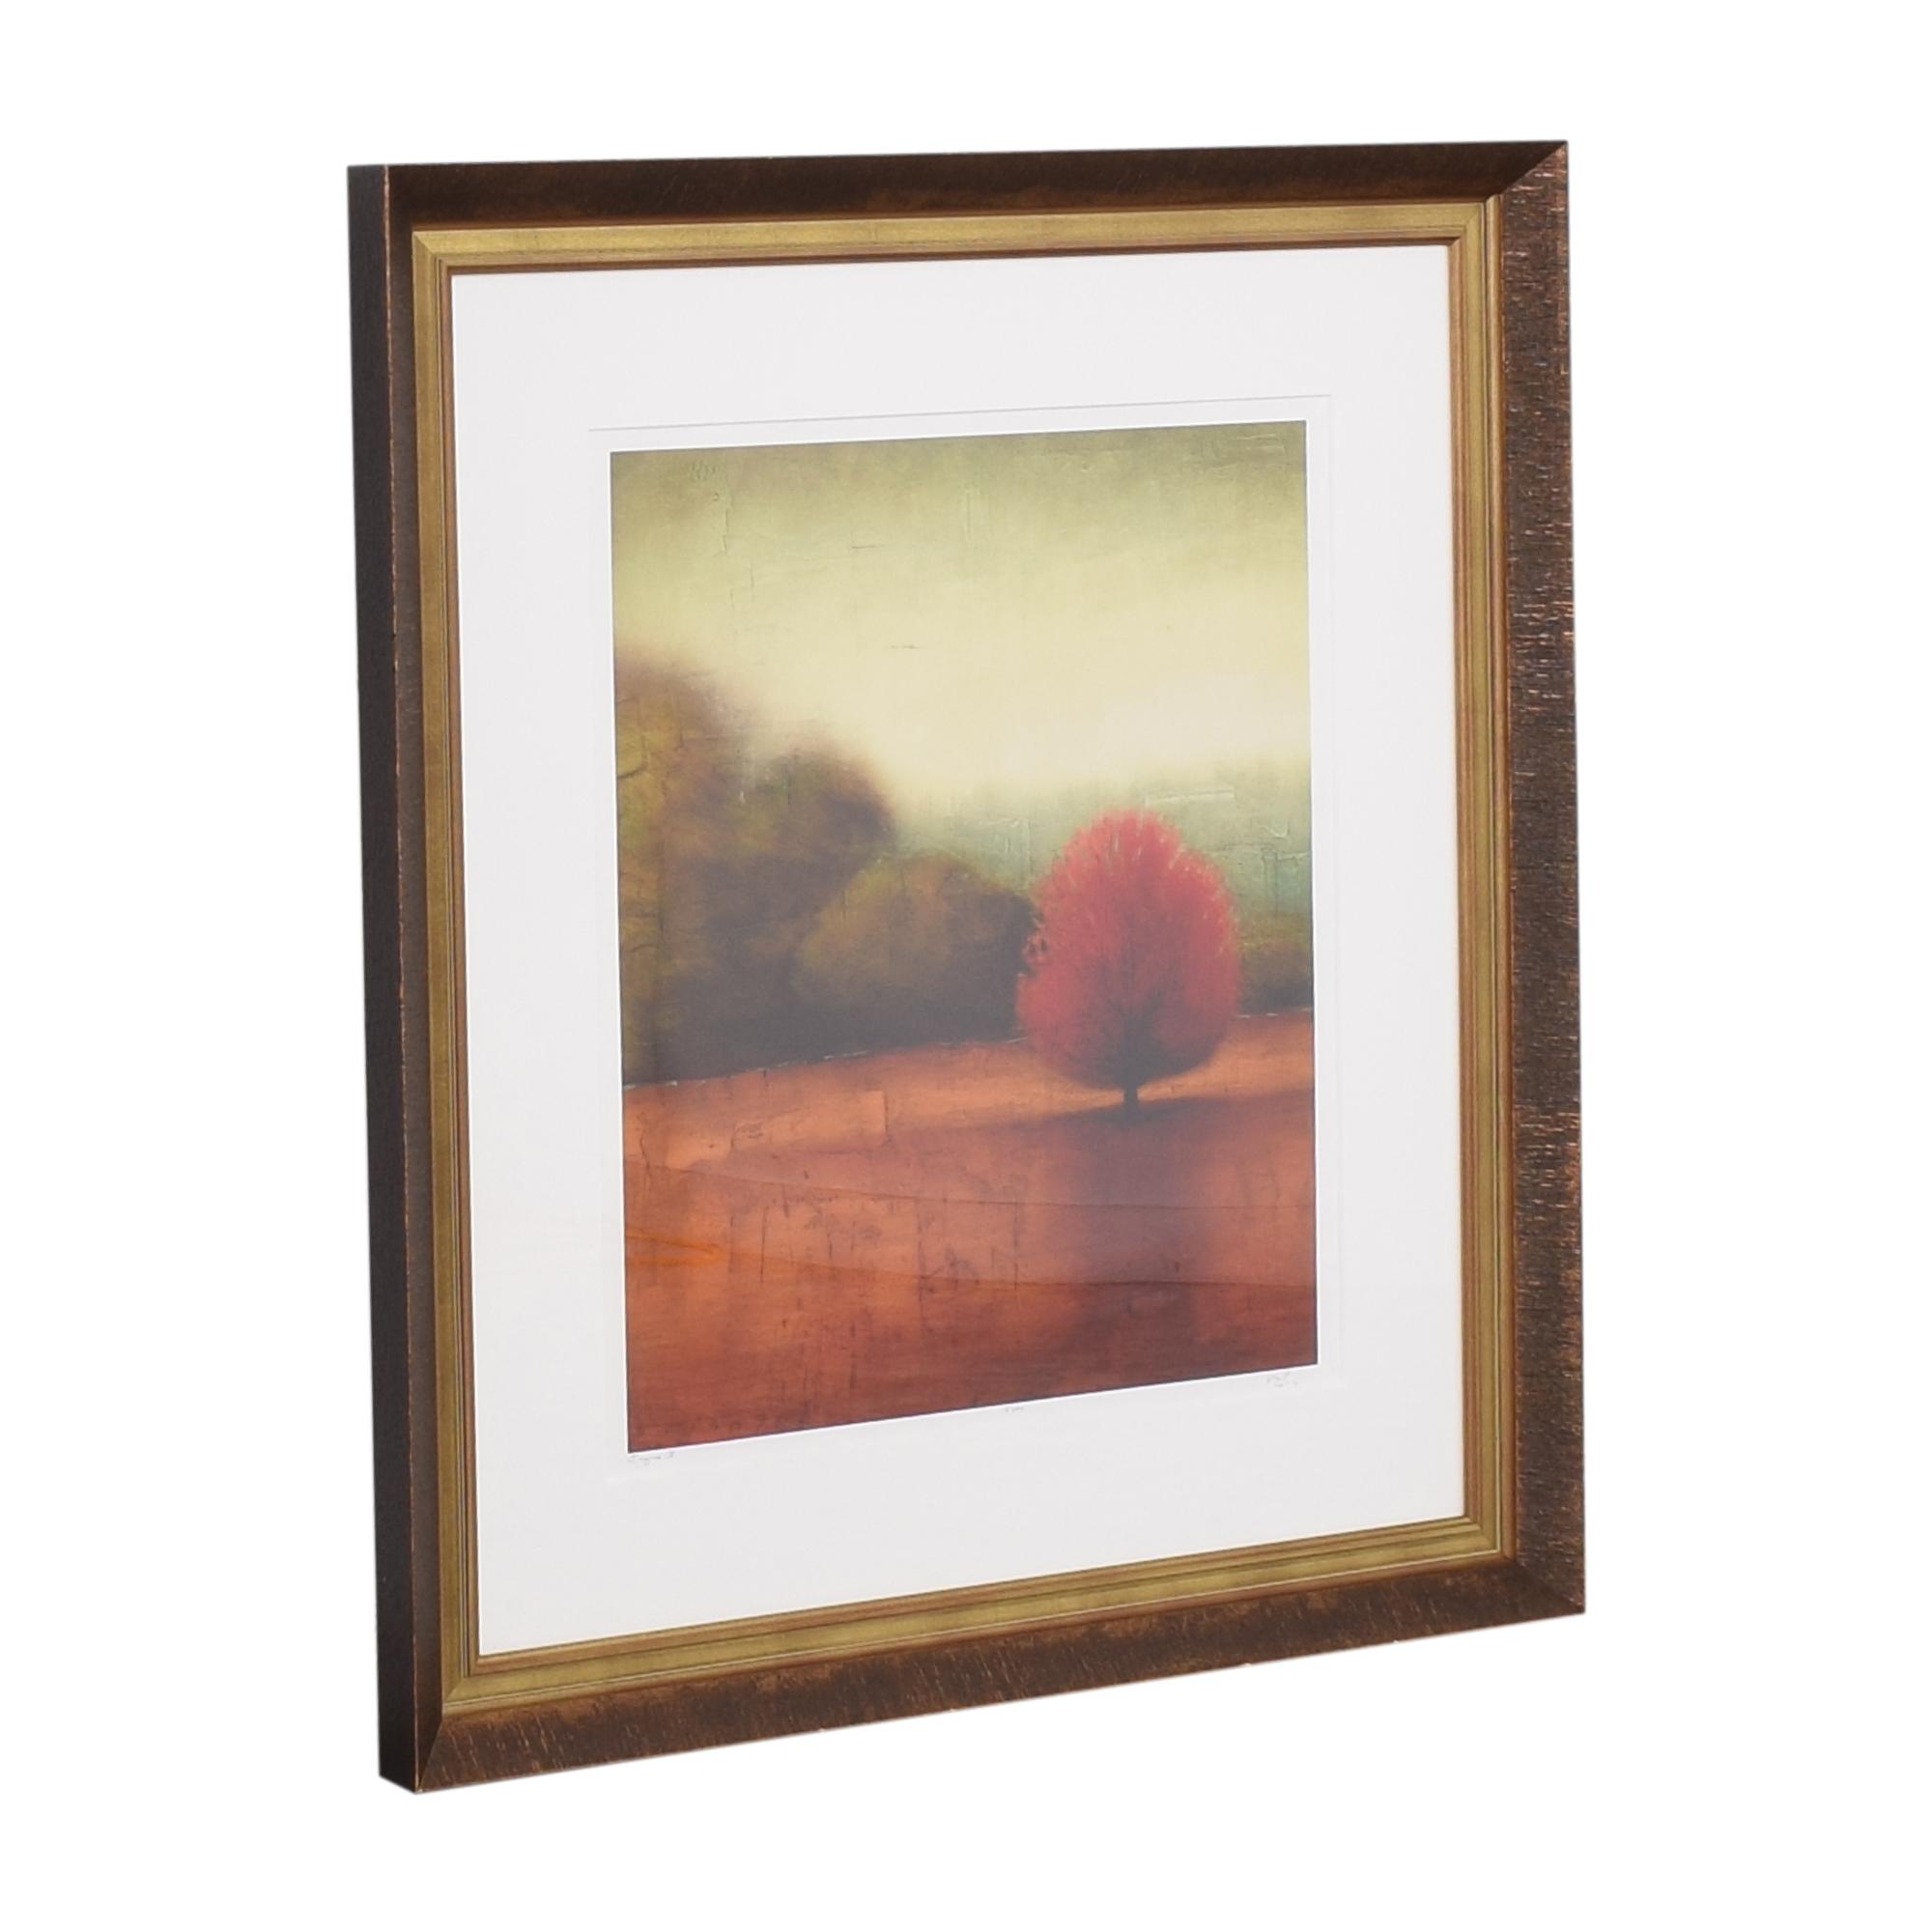 Deljou Art Group Vincent George Equinox VI Framed Wall Art dimensions